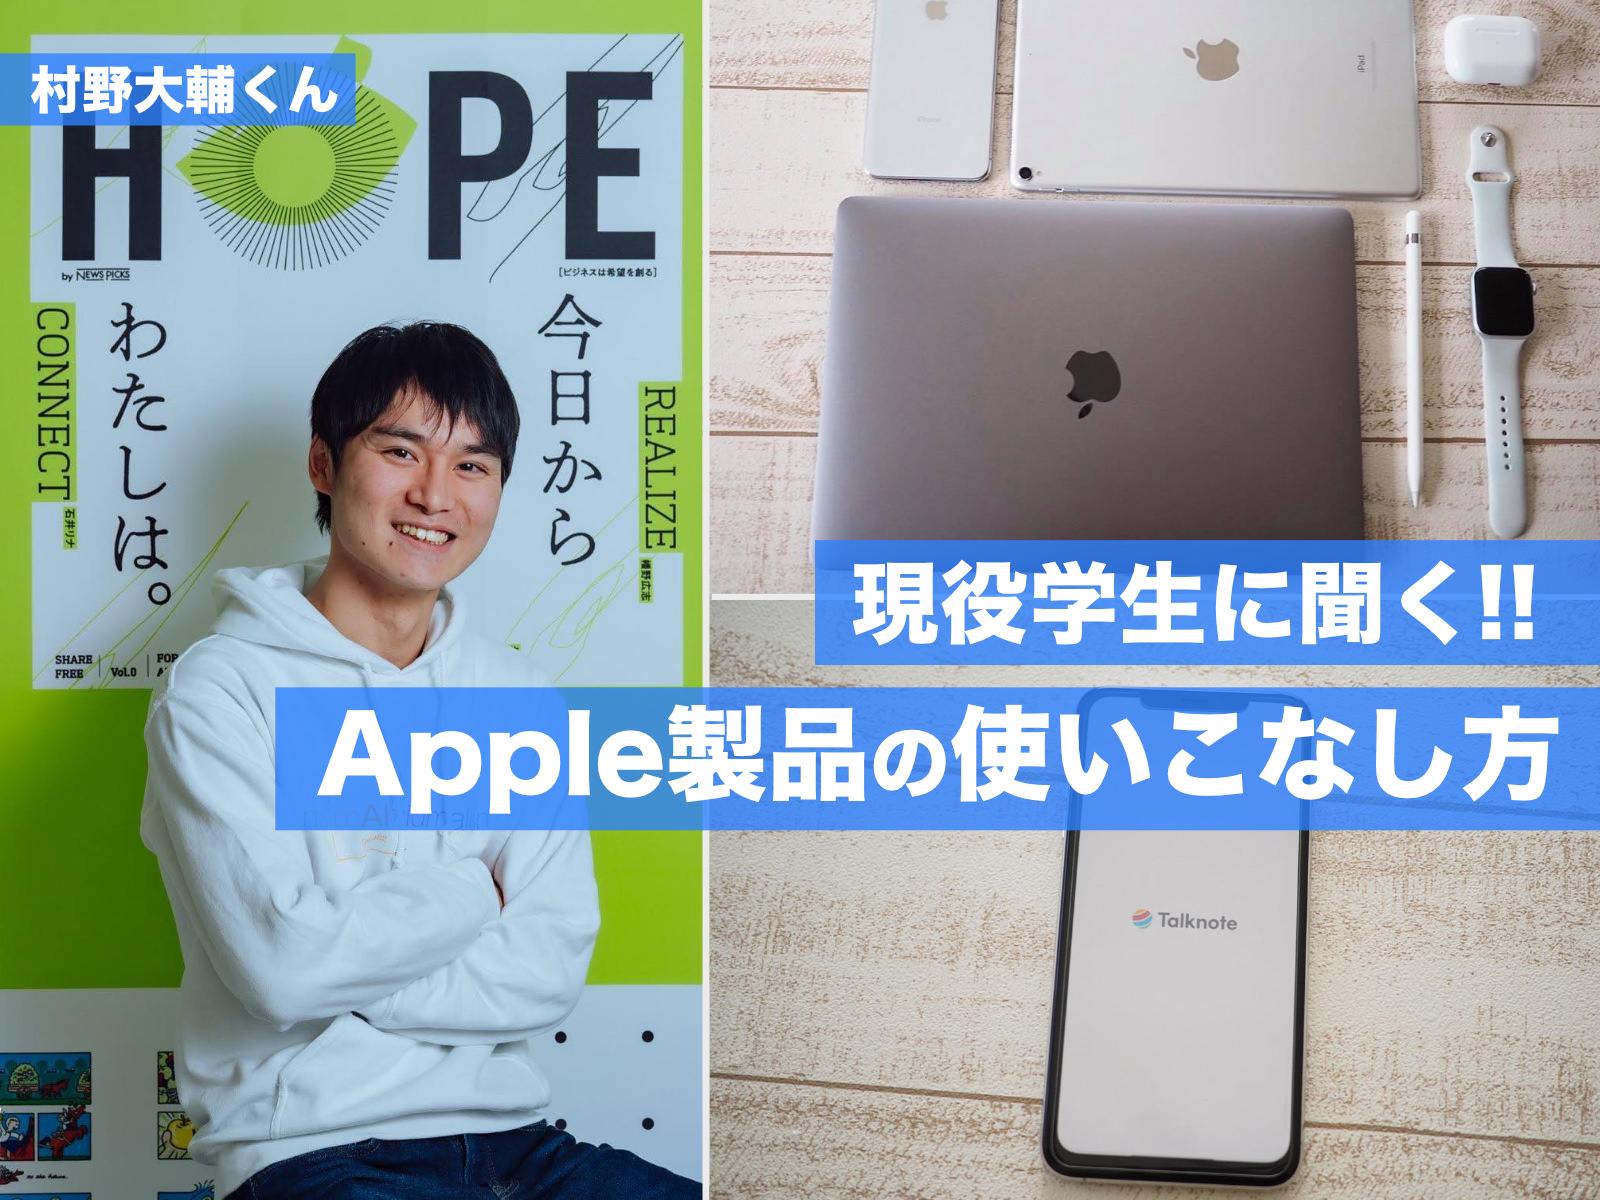 Apple backtoschool campaign interview 2020 murano